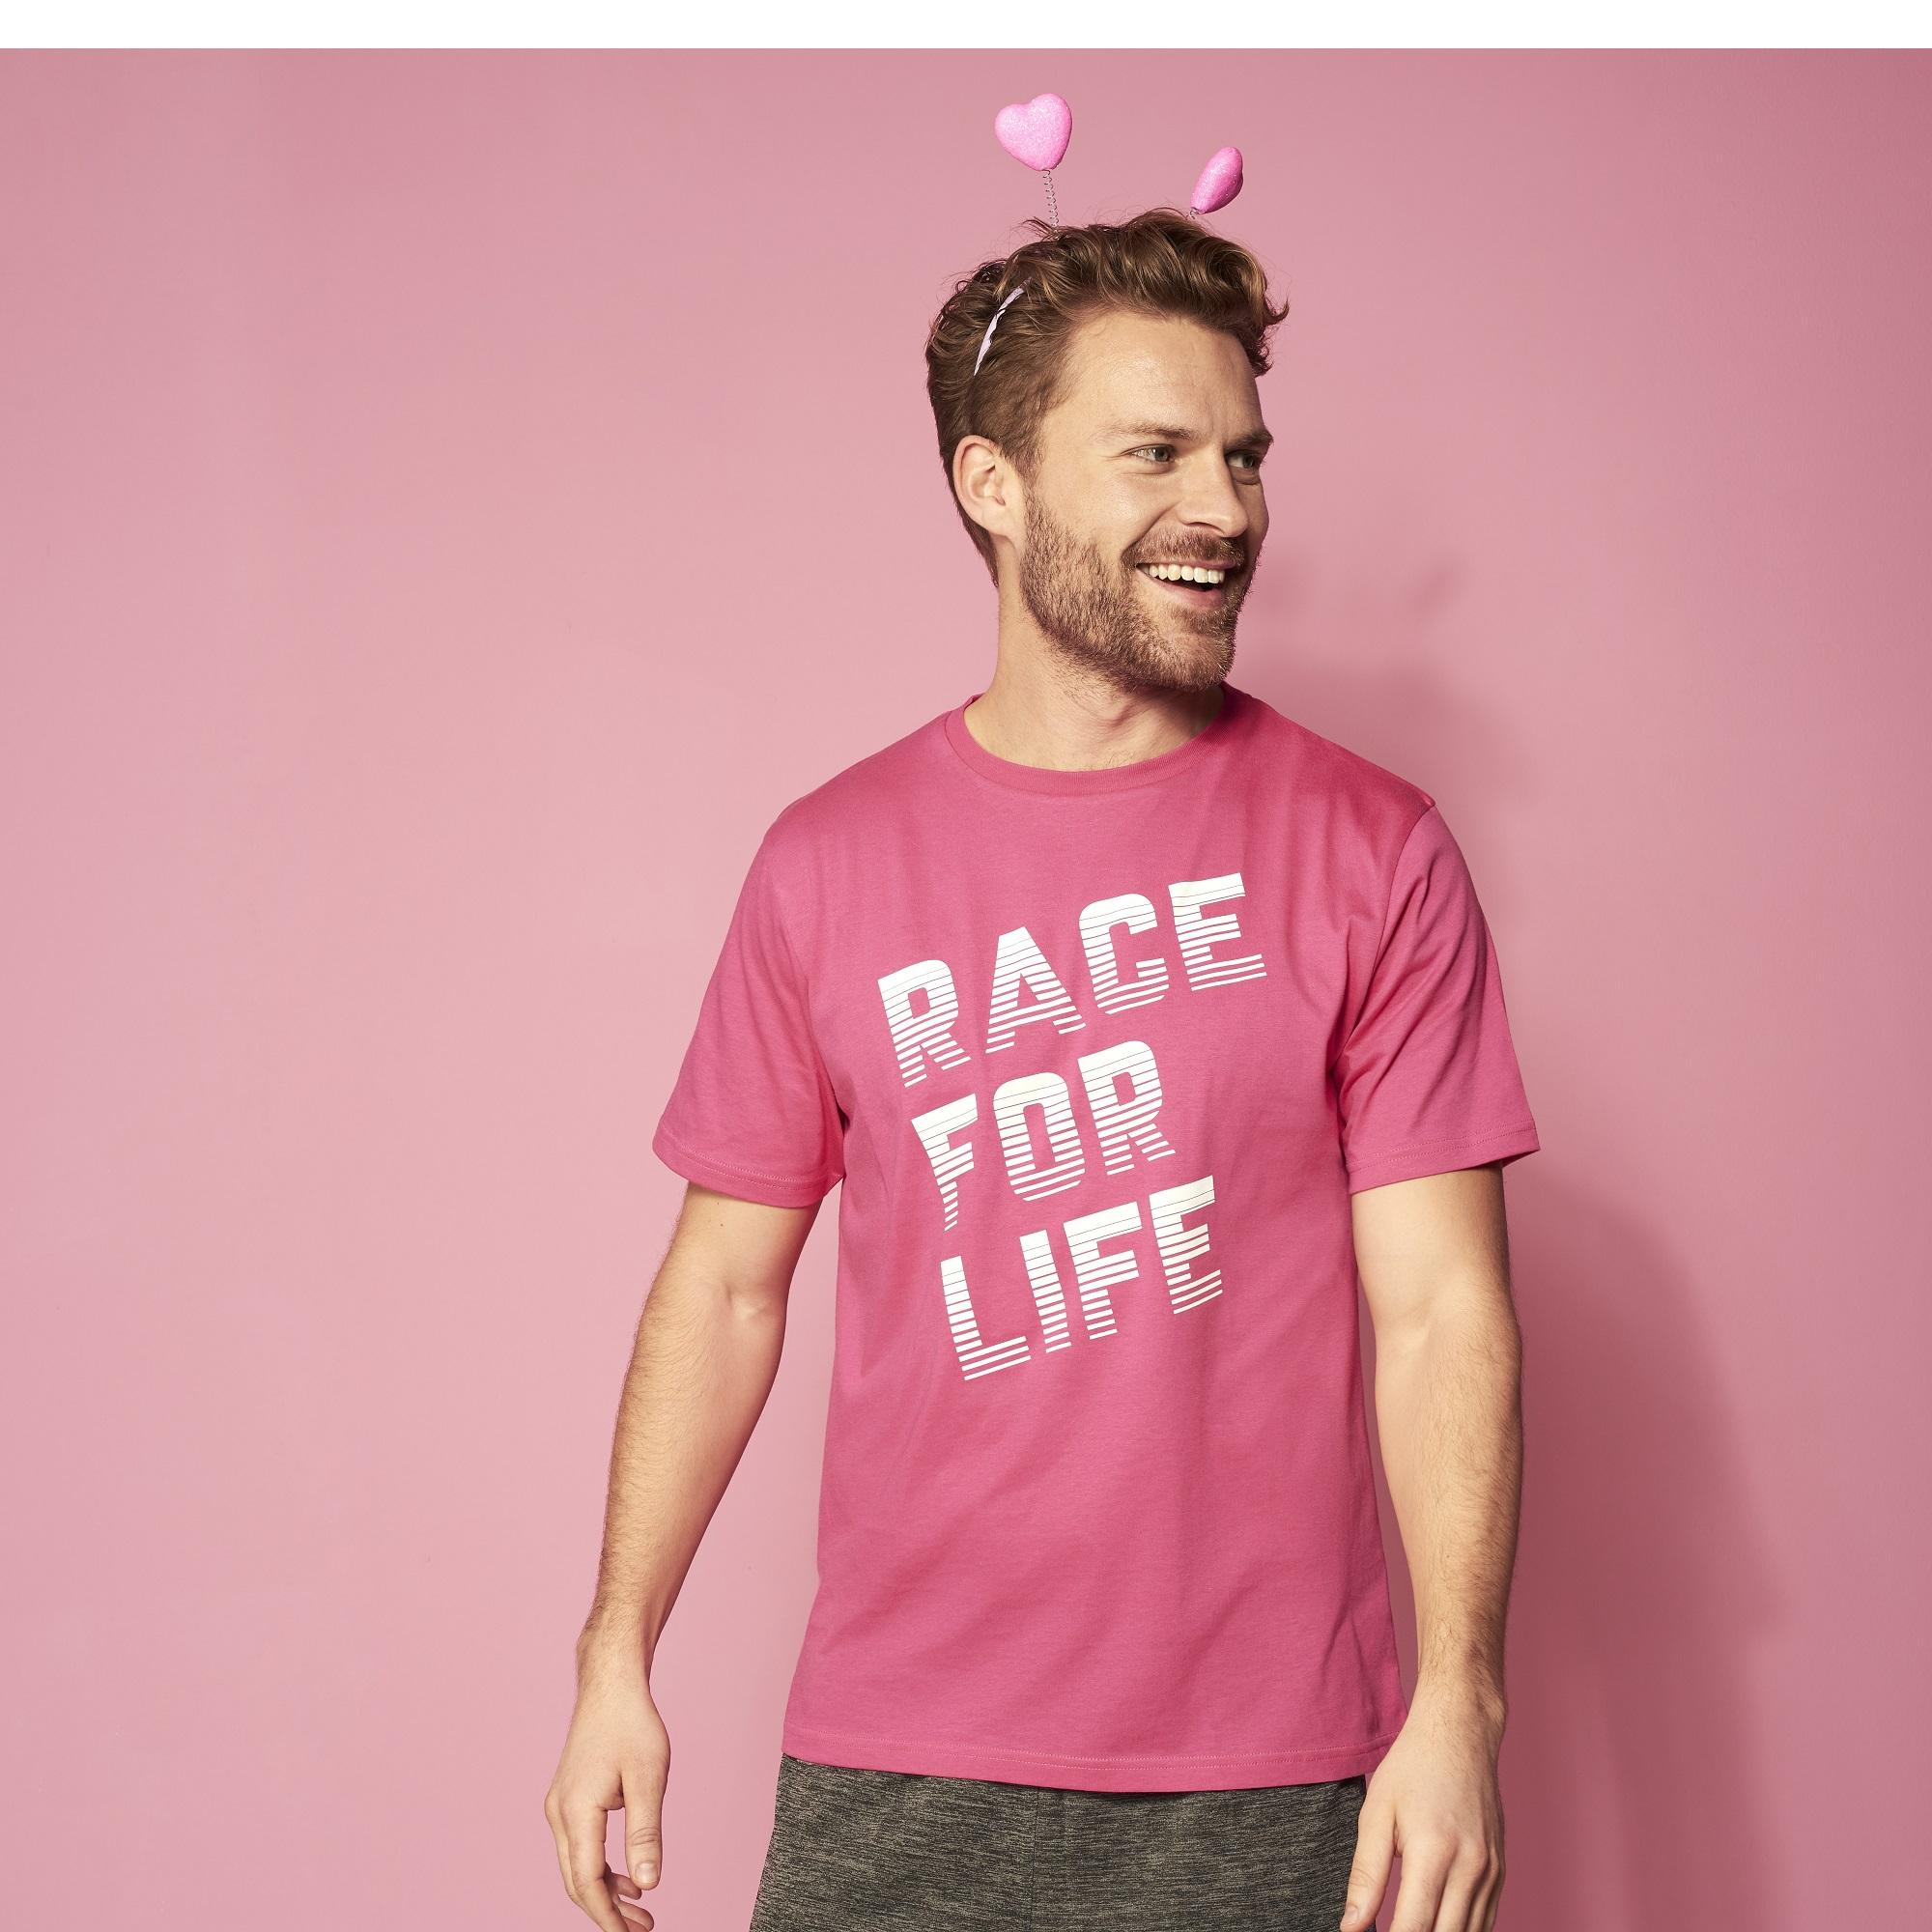 Race for Life 2019 Mens Racer Design T-shirt | Cancer Research UK